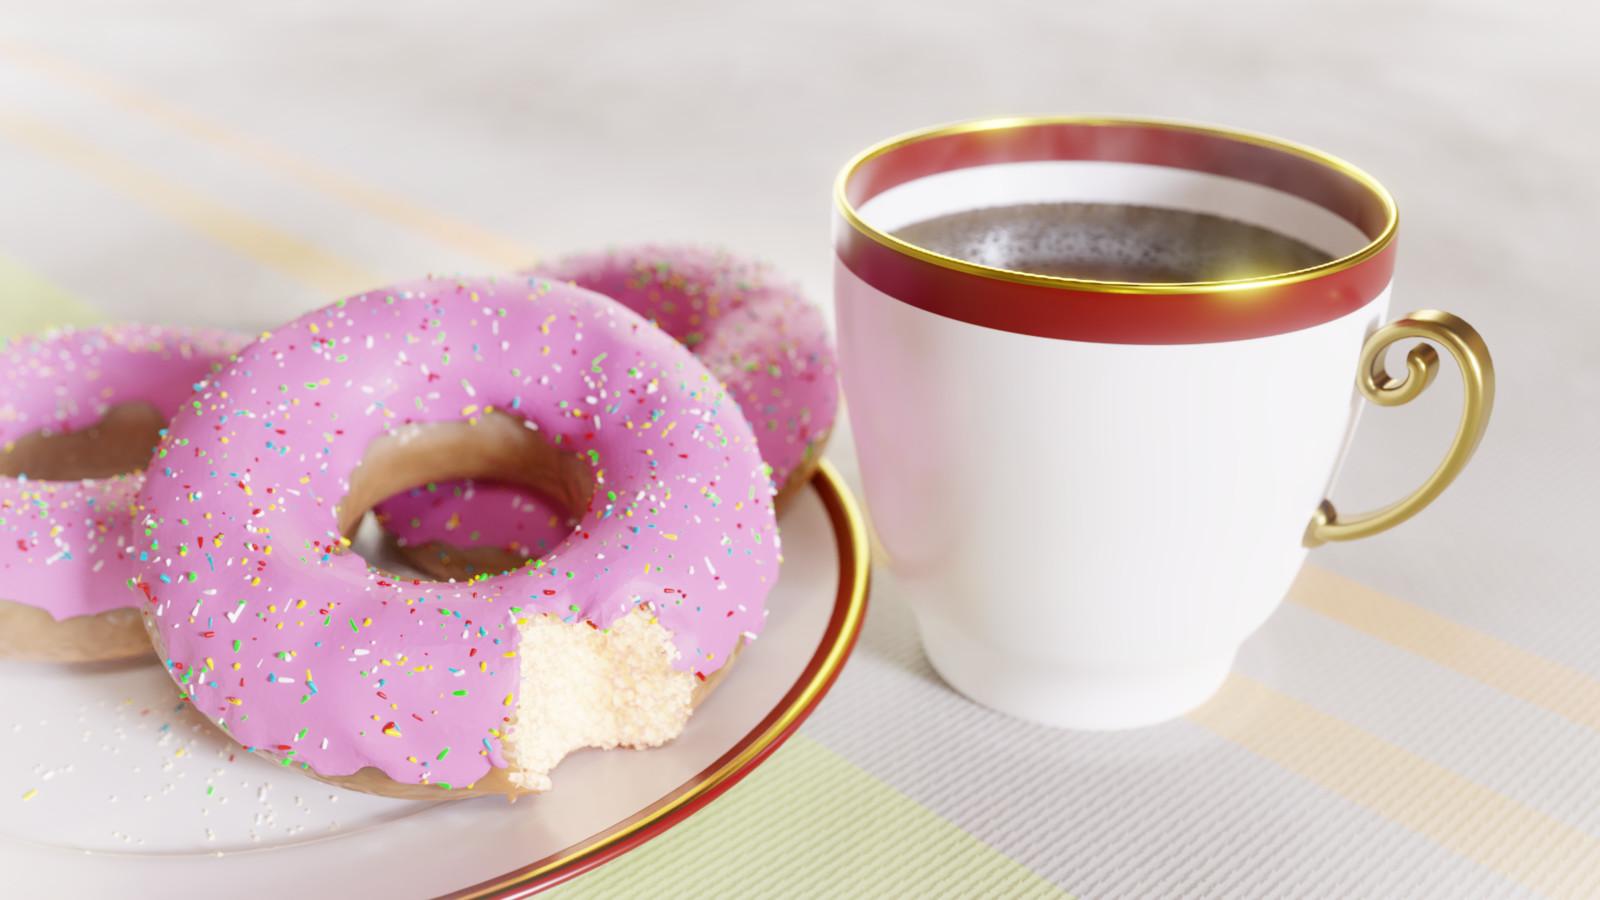 Blender doughnuts